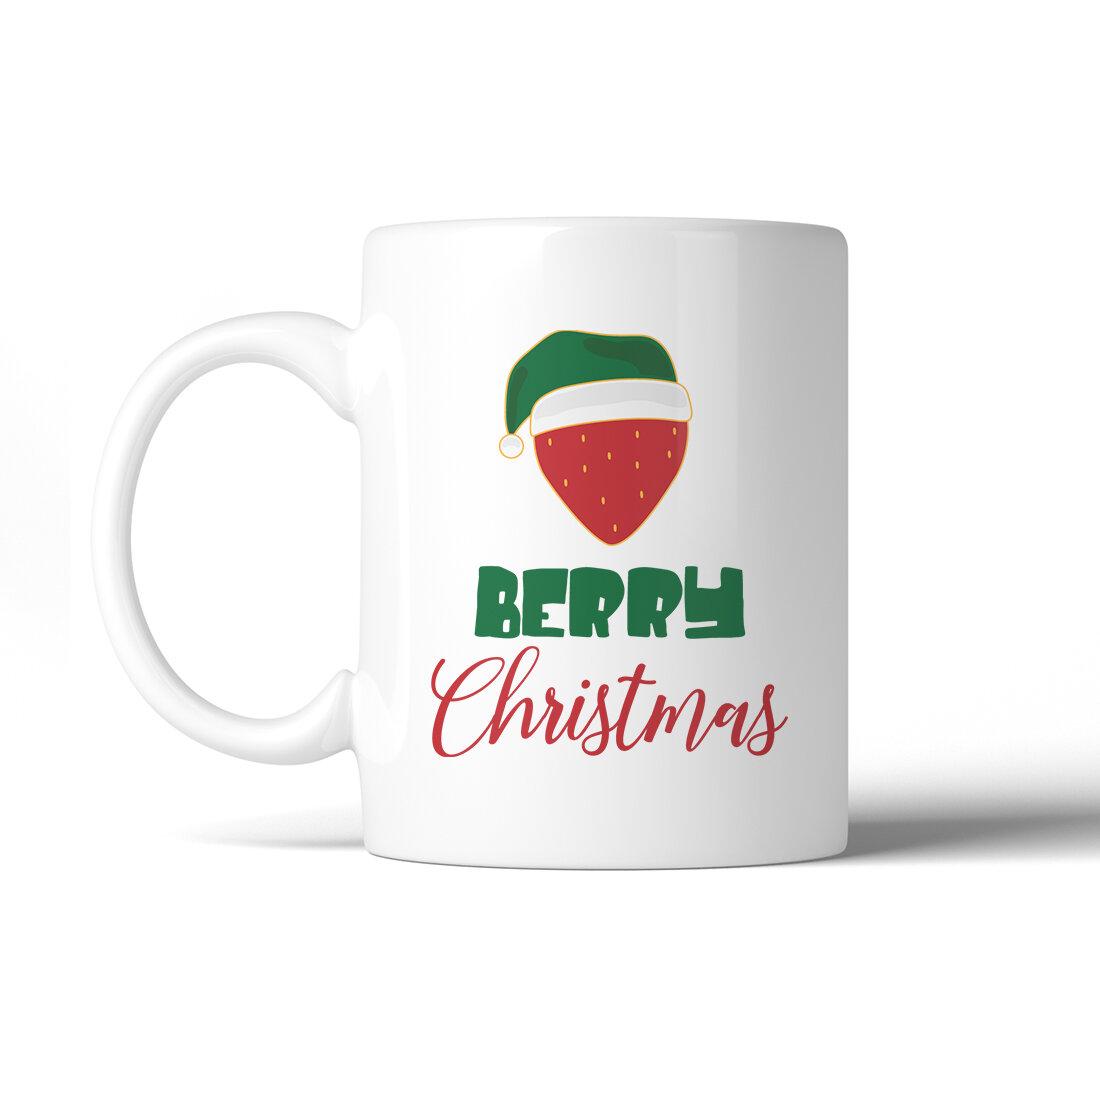 The Holiday Aisle Ludowici Berry Christmas Coffee Mug Wayfair